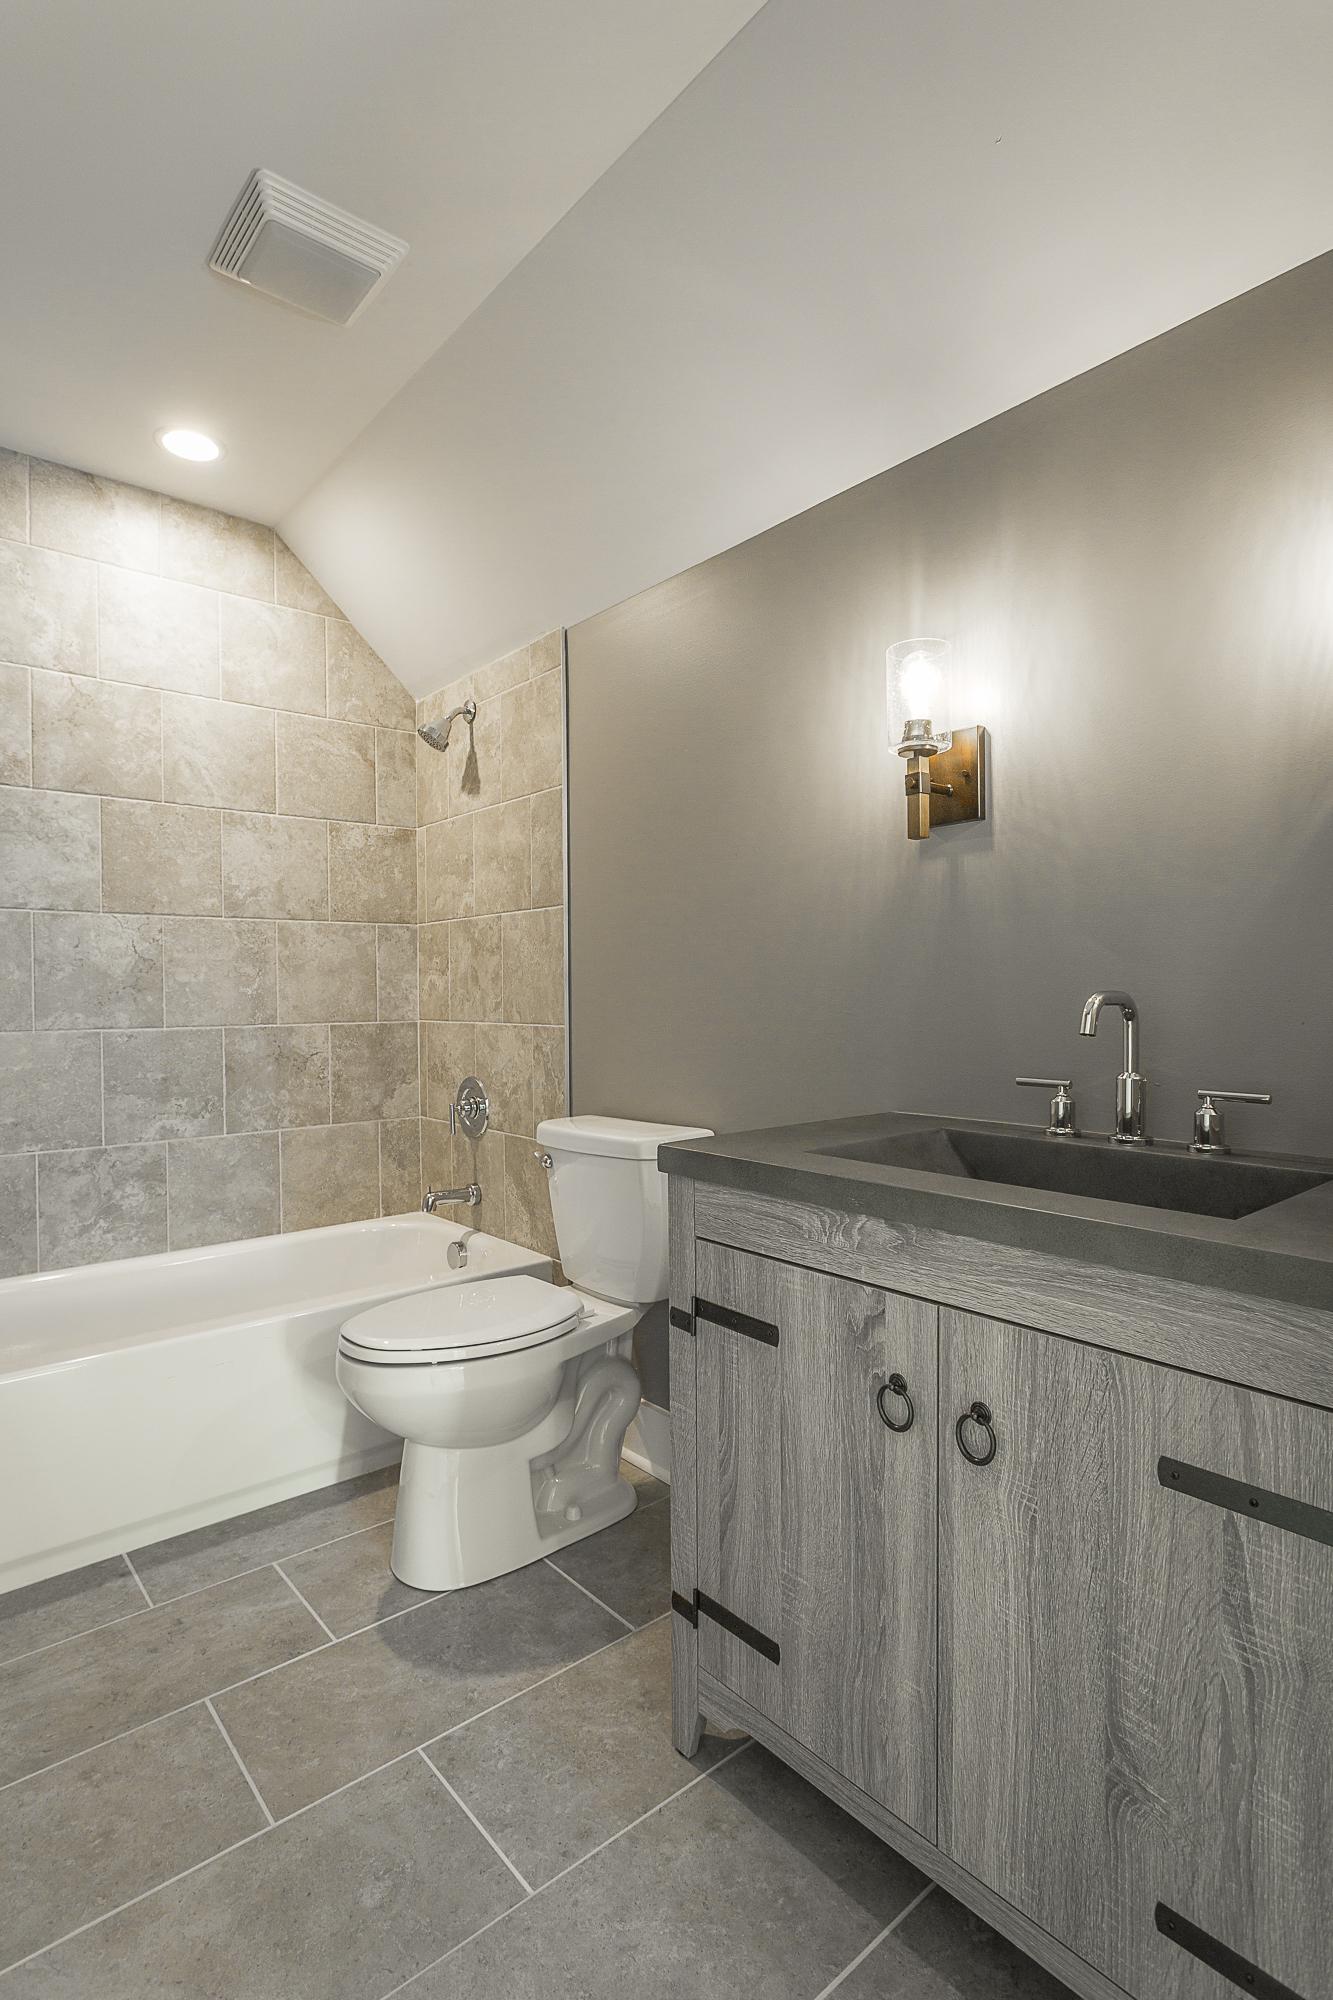 lot 3 selcer bathroom 2.jpg